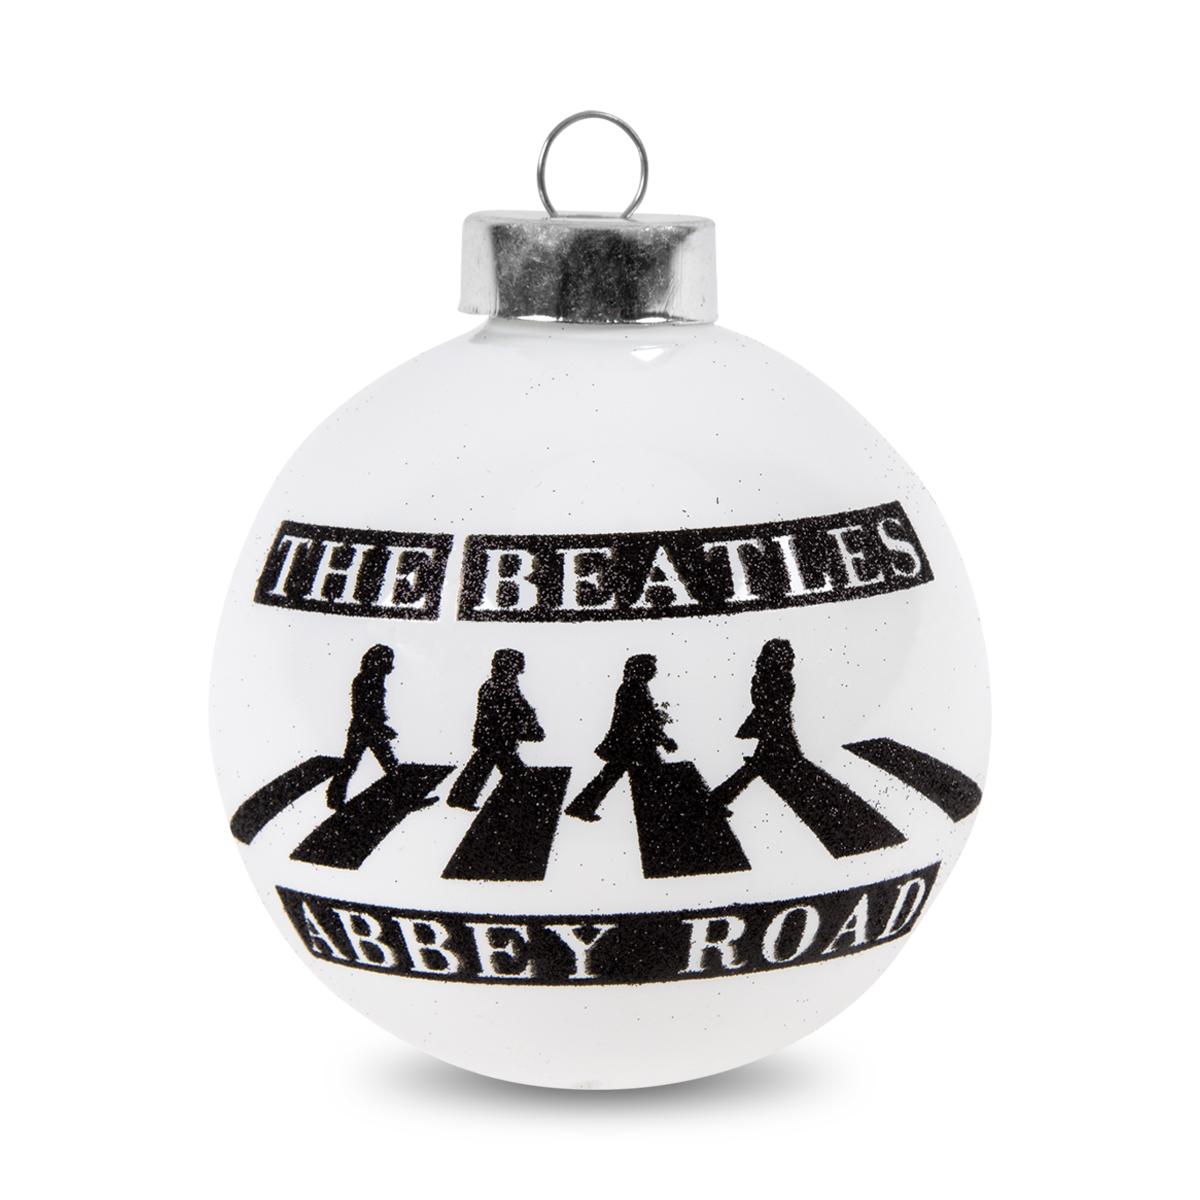 The Beatles Holiday Ornament Box Set